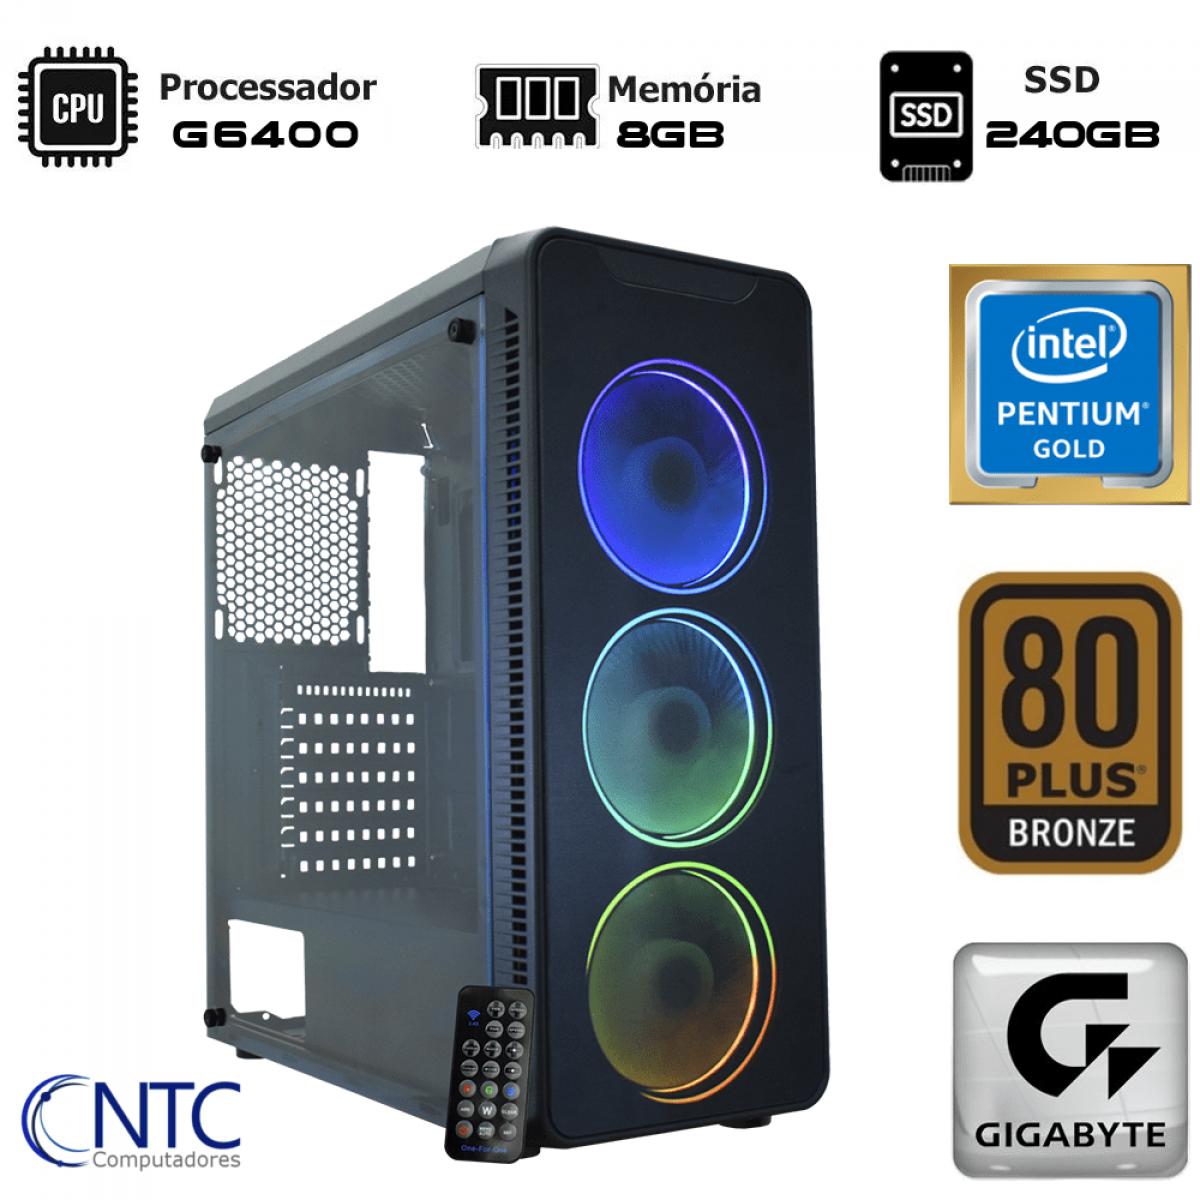 Computador NTC T-Home Intel Pentium G6400 / 8GB DDR4 / SSD 240GB / Windows 10 Pro / Fonte 400W